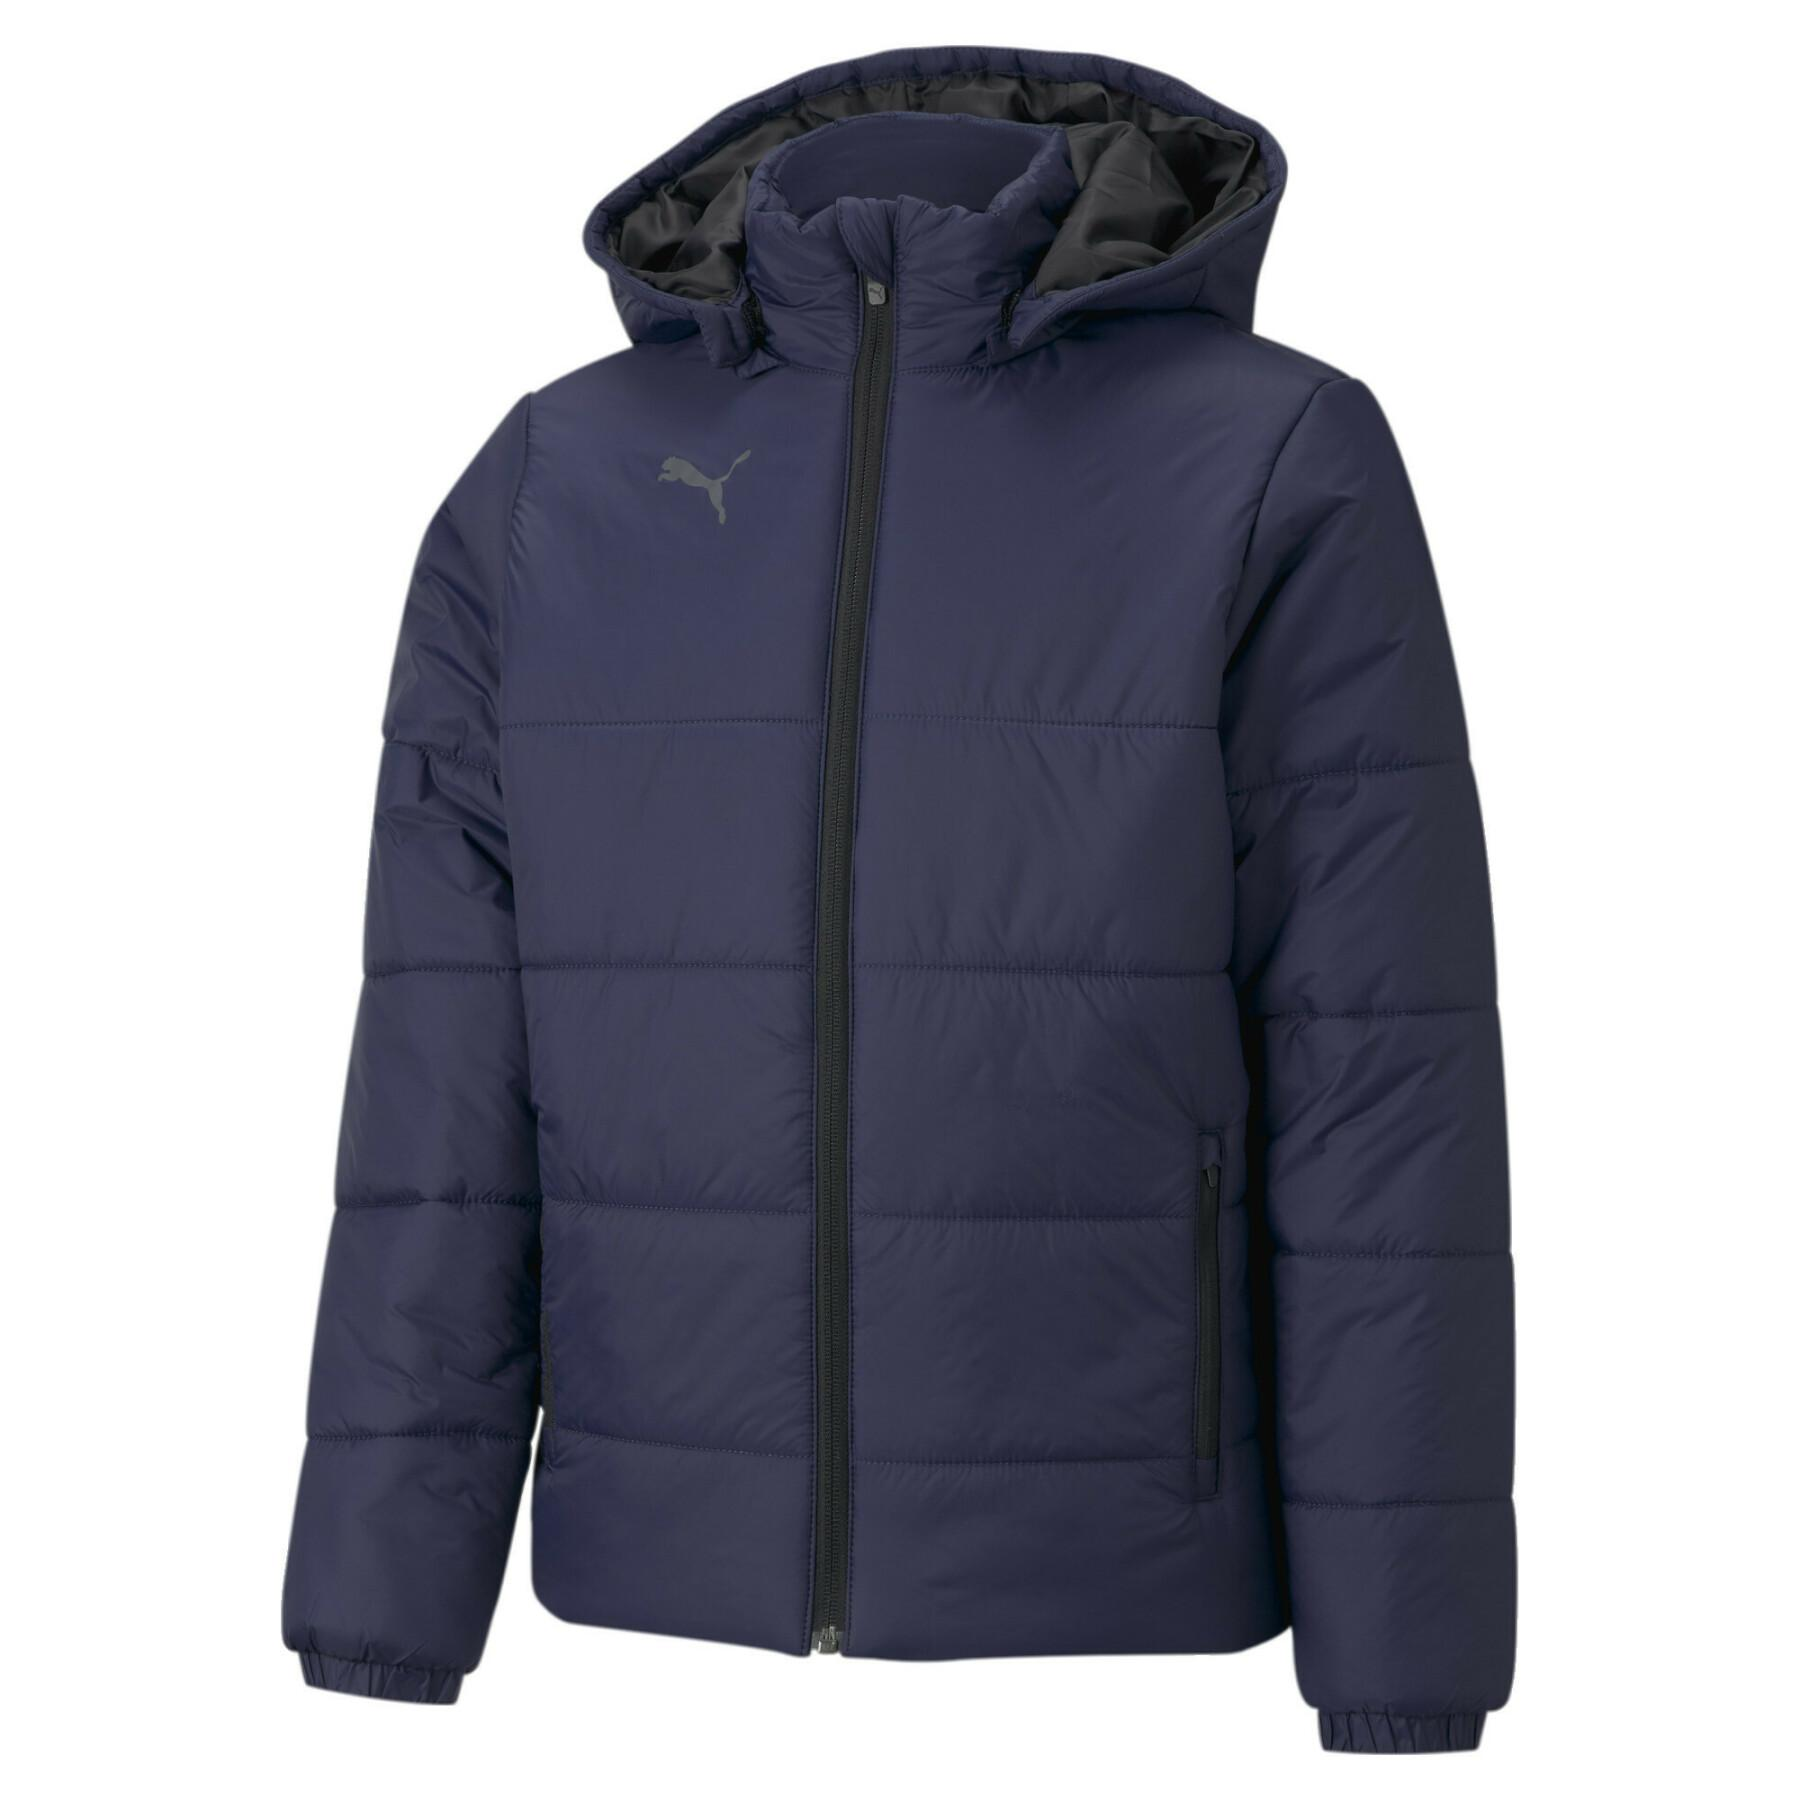 Children's jacket Puma teamLIGA Padded